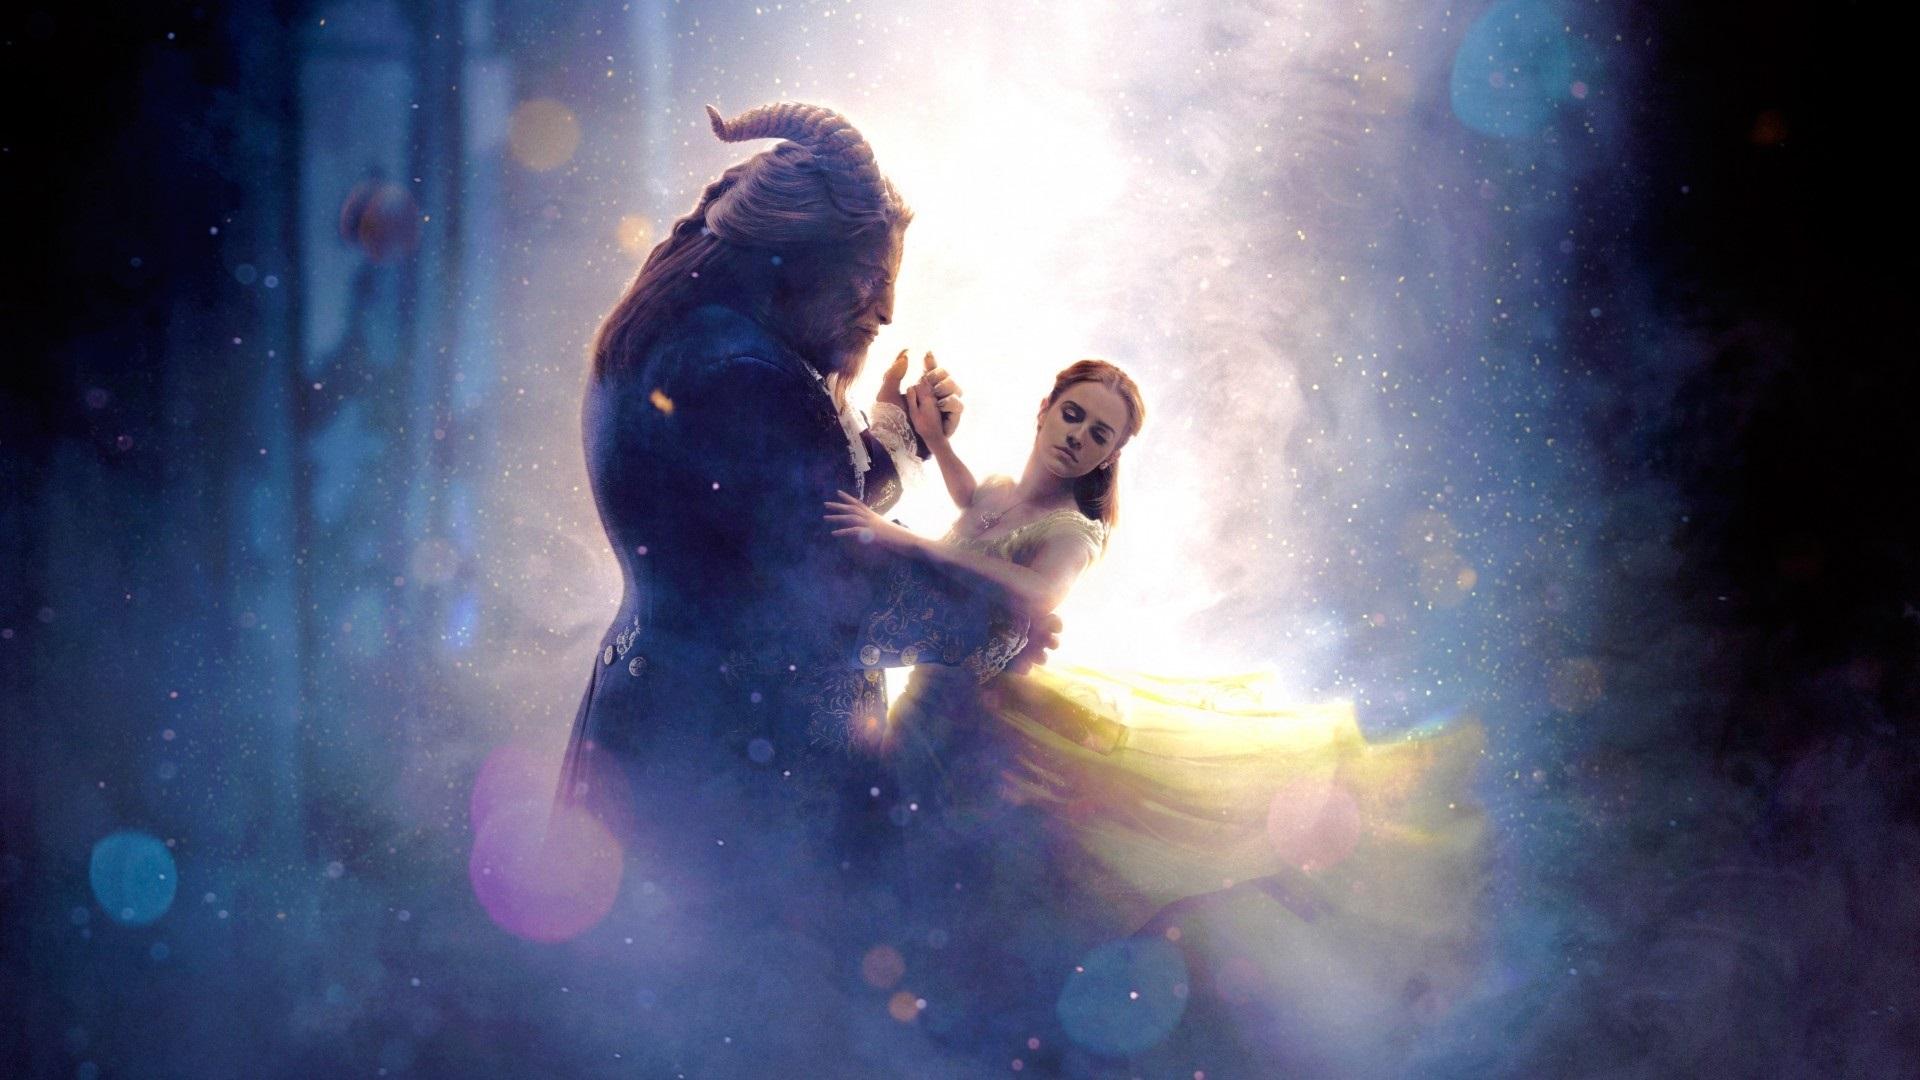 Картинки фильм красавица и чудовище 2017002